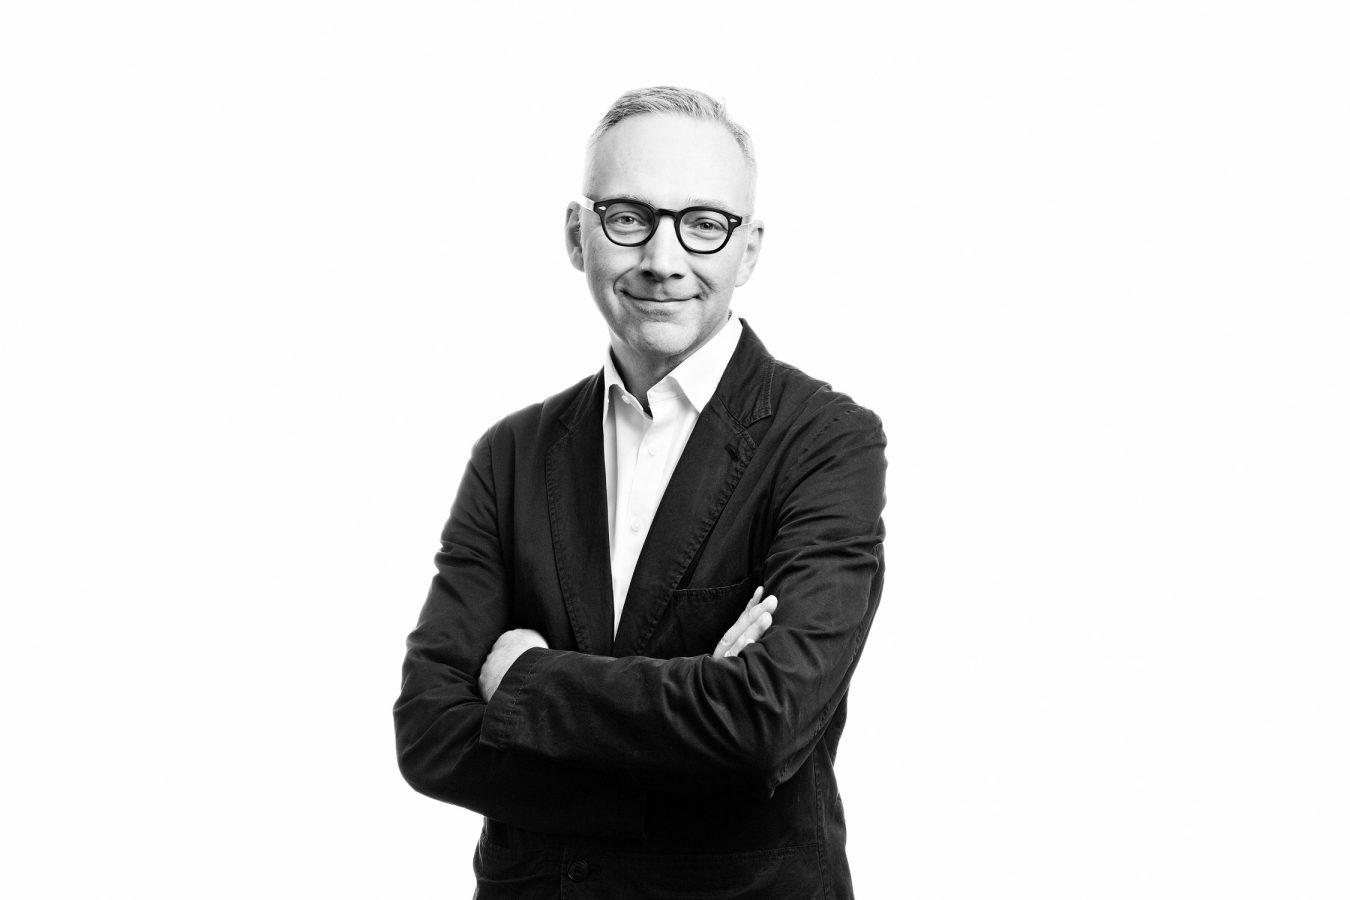 Taylor-Vinters-staff-portrait-studio-black-and-white-london-male